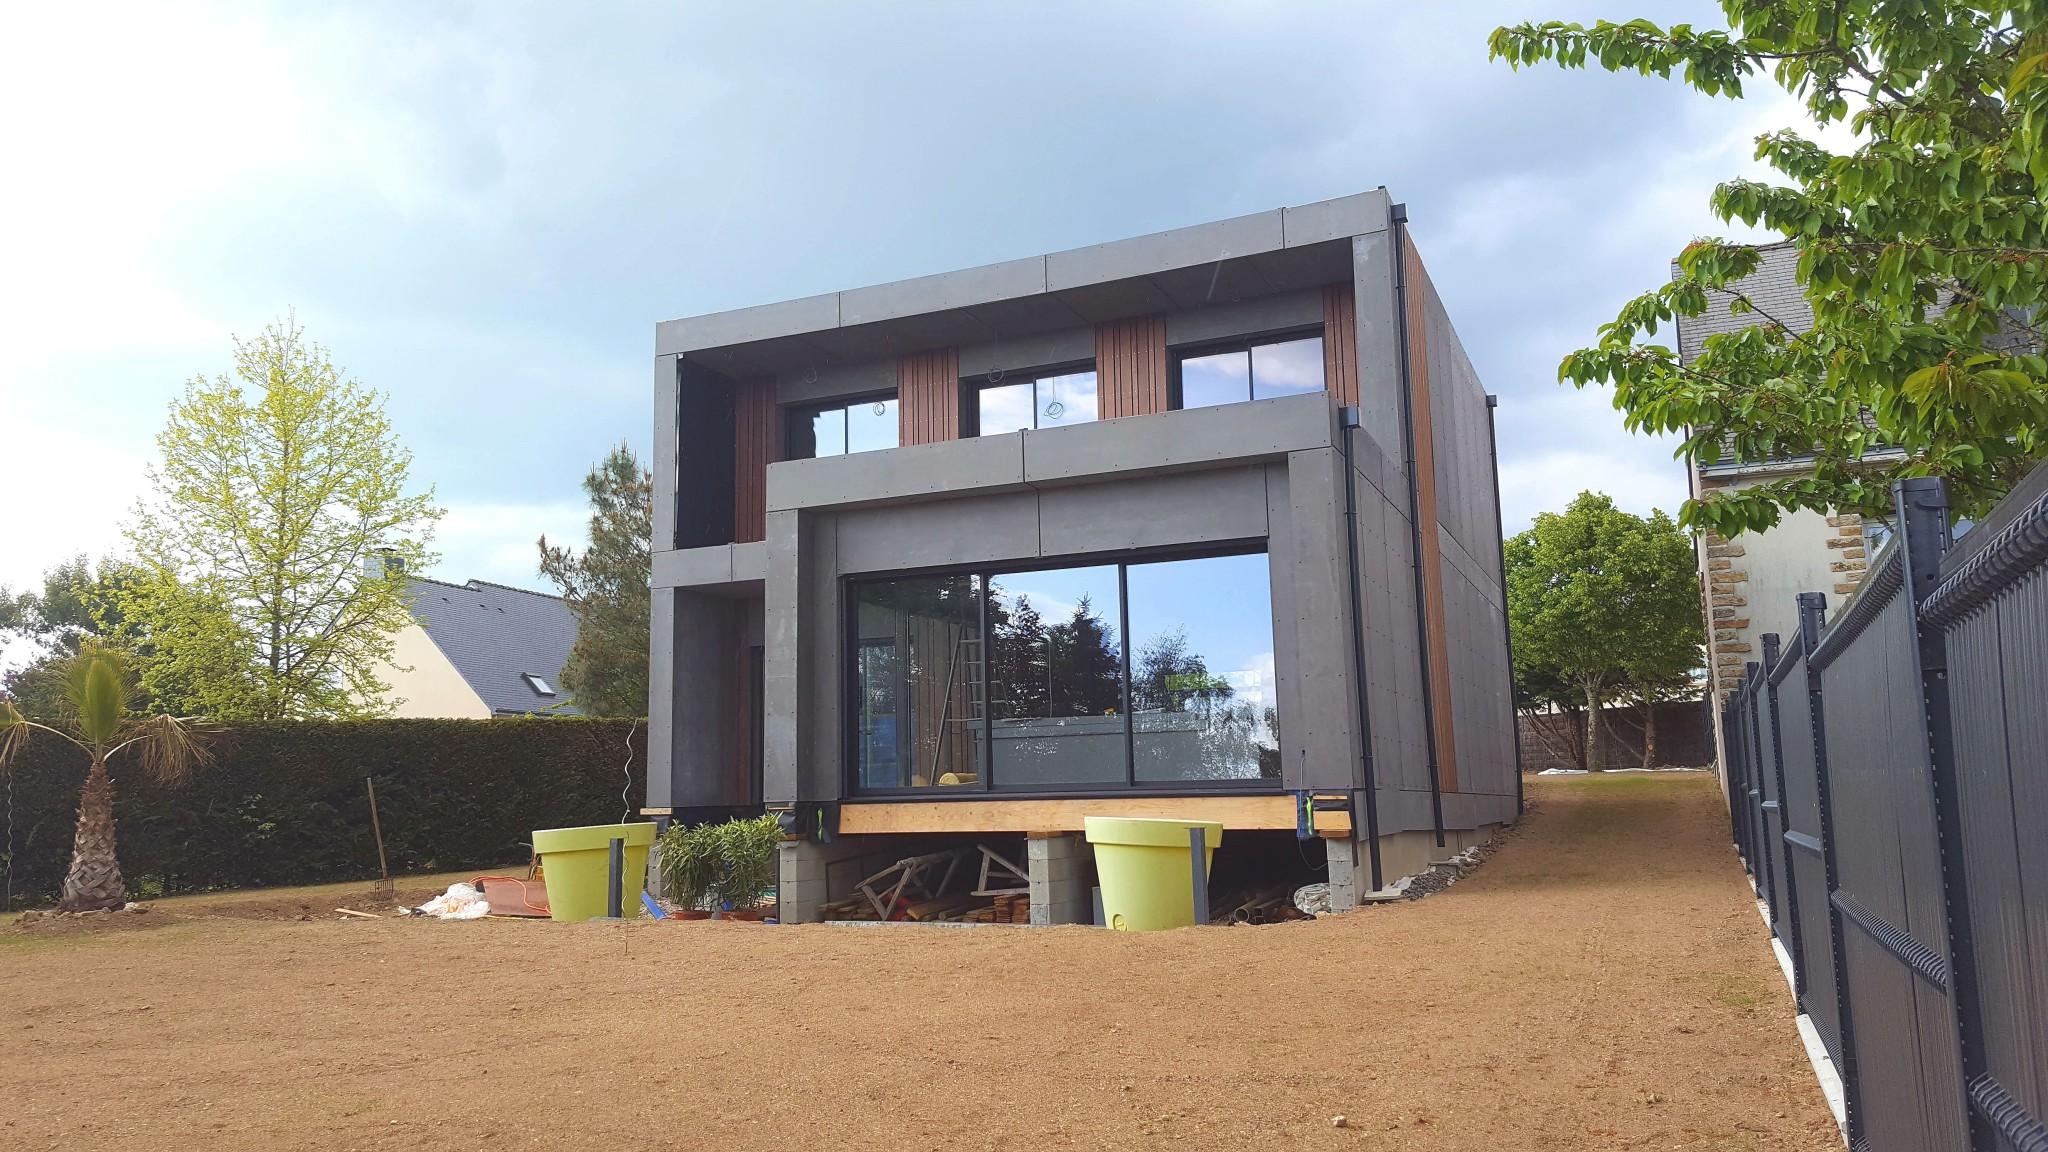 pop up house 2017 small house interior design. Black Bedroom Furniture Sets. Home Design Ideas